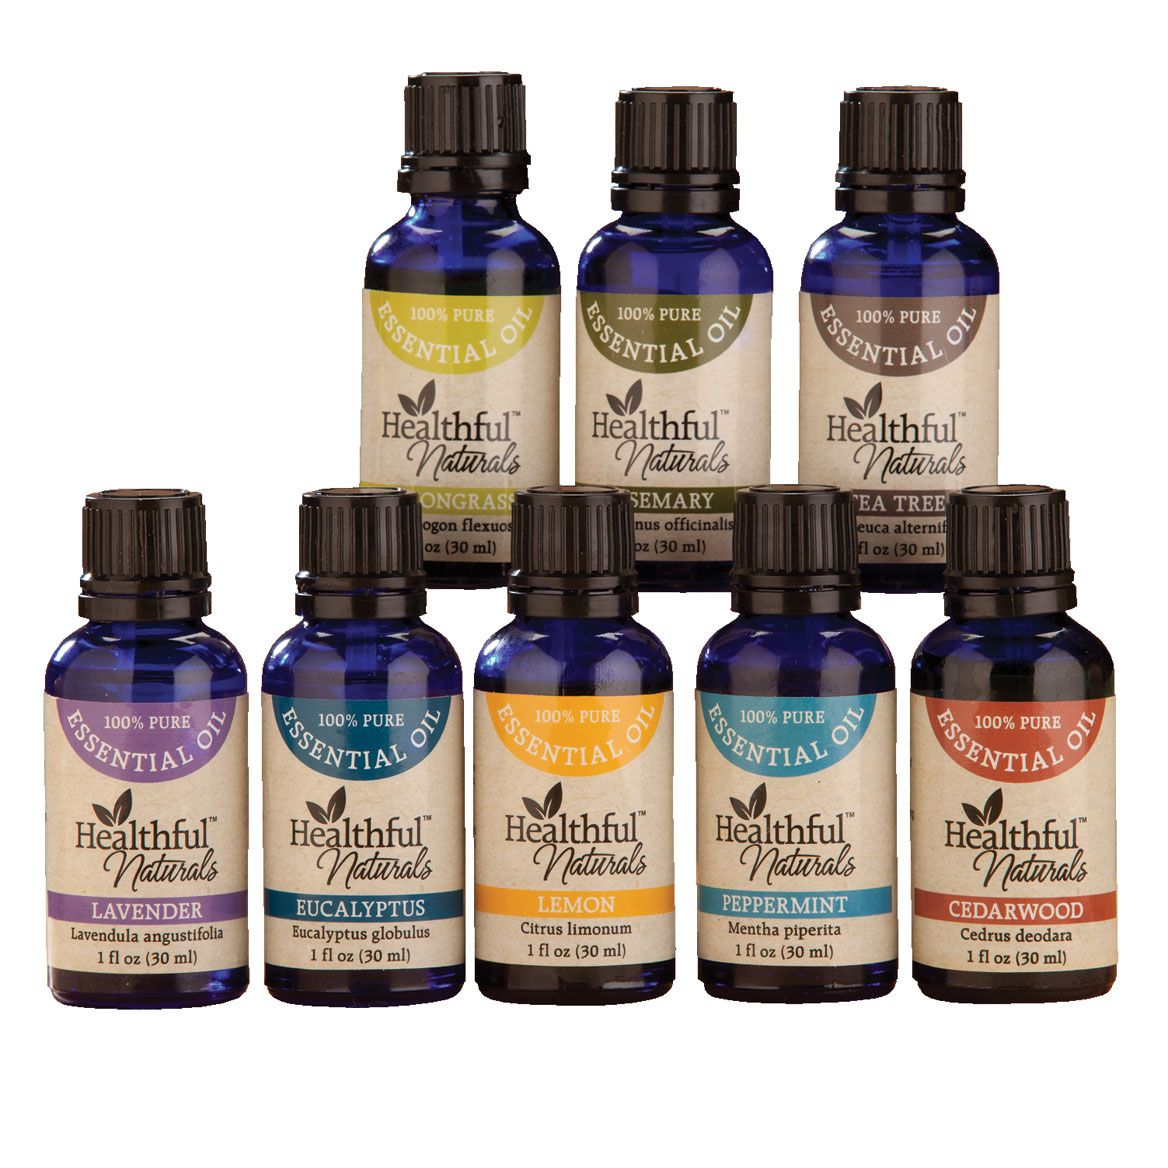 Healthful™ Naturals Deluxe Essential Oil Kit-356536